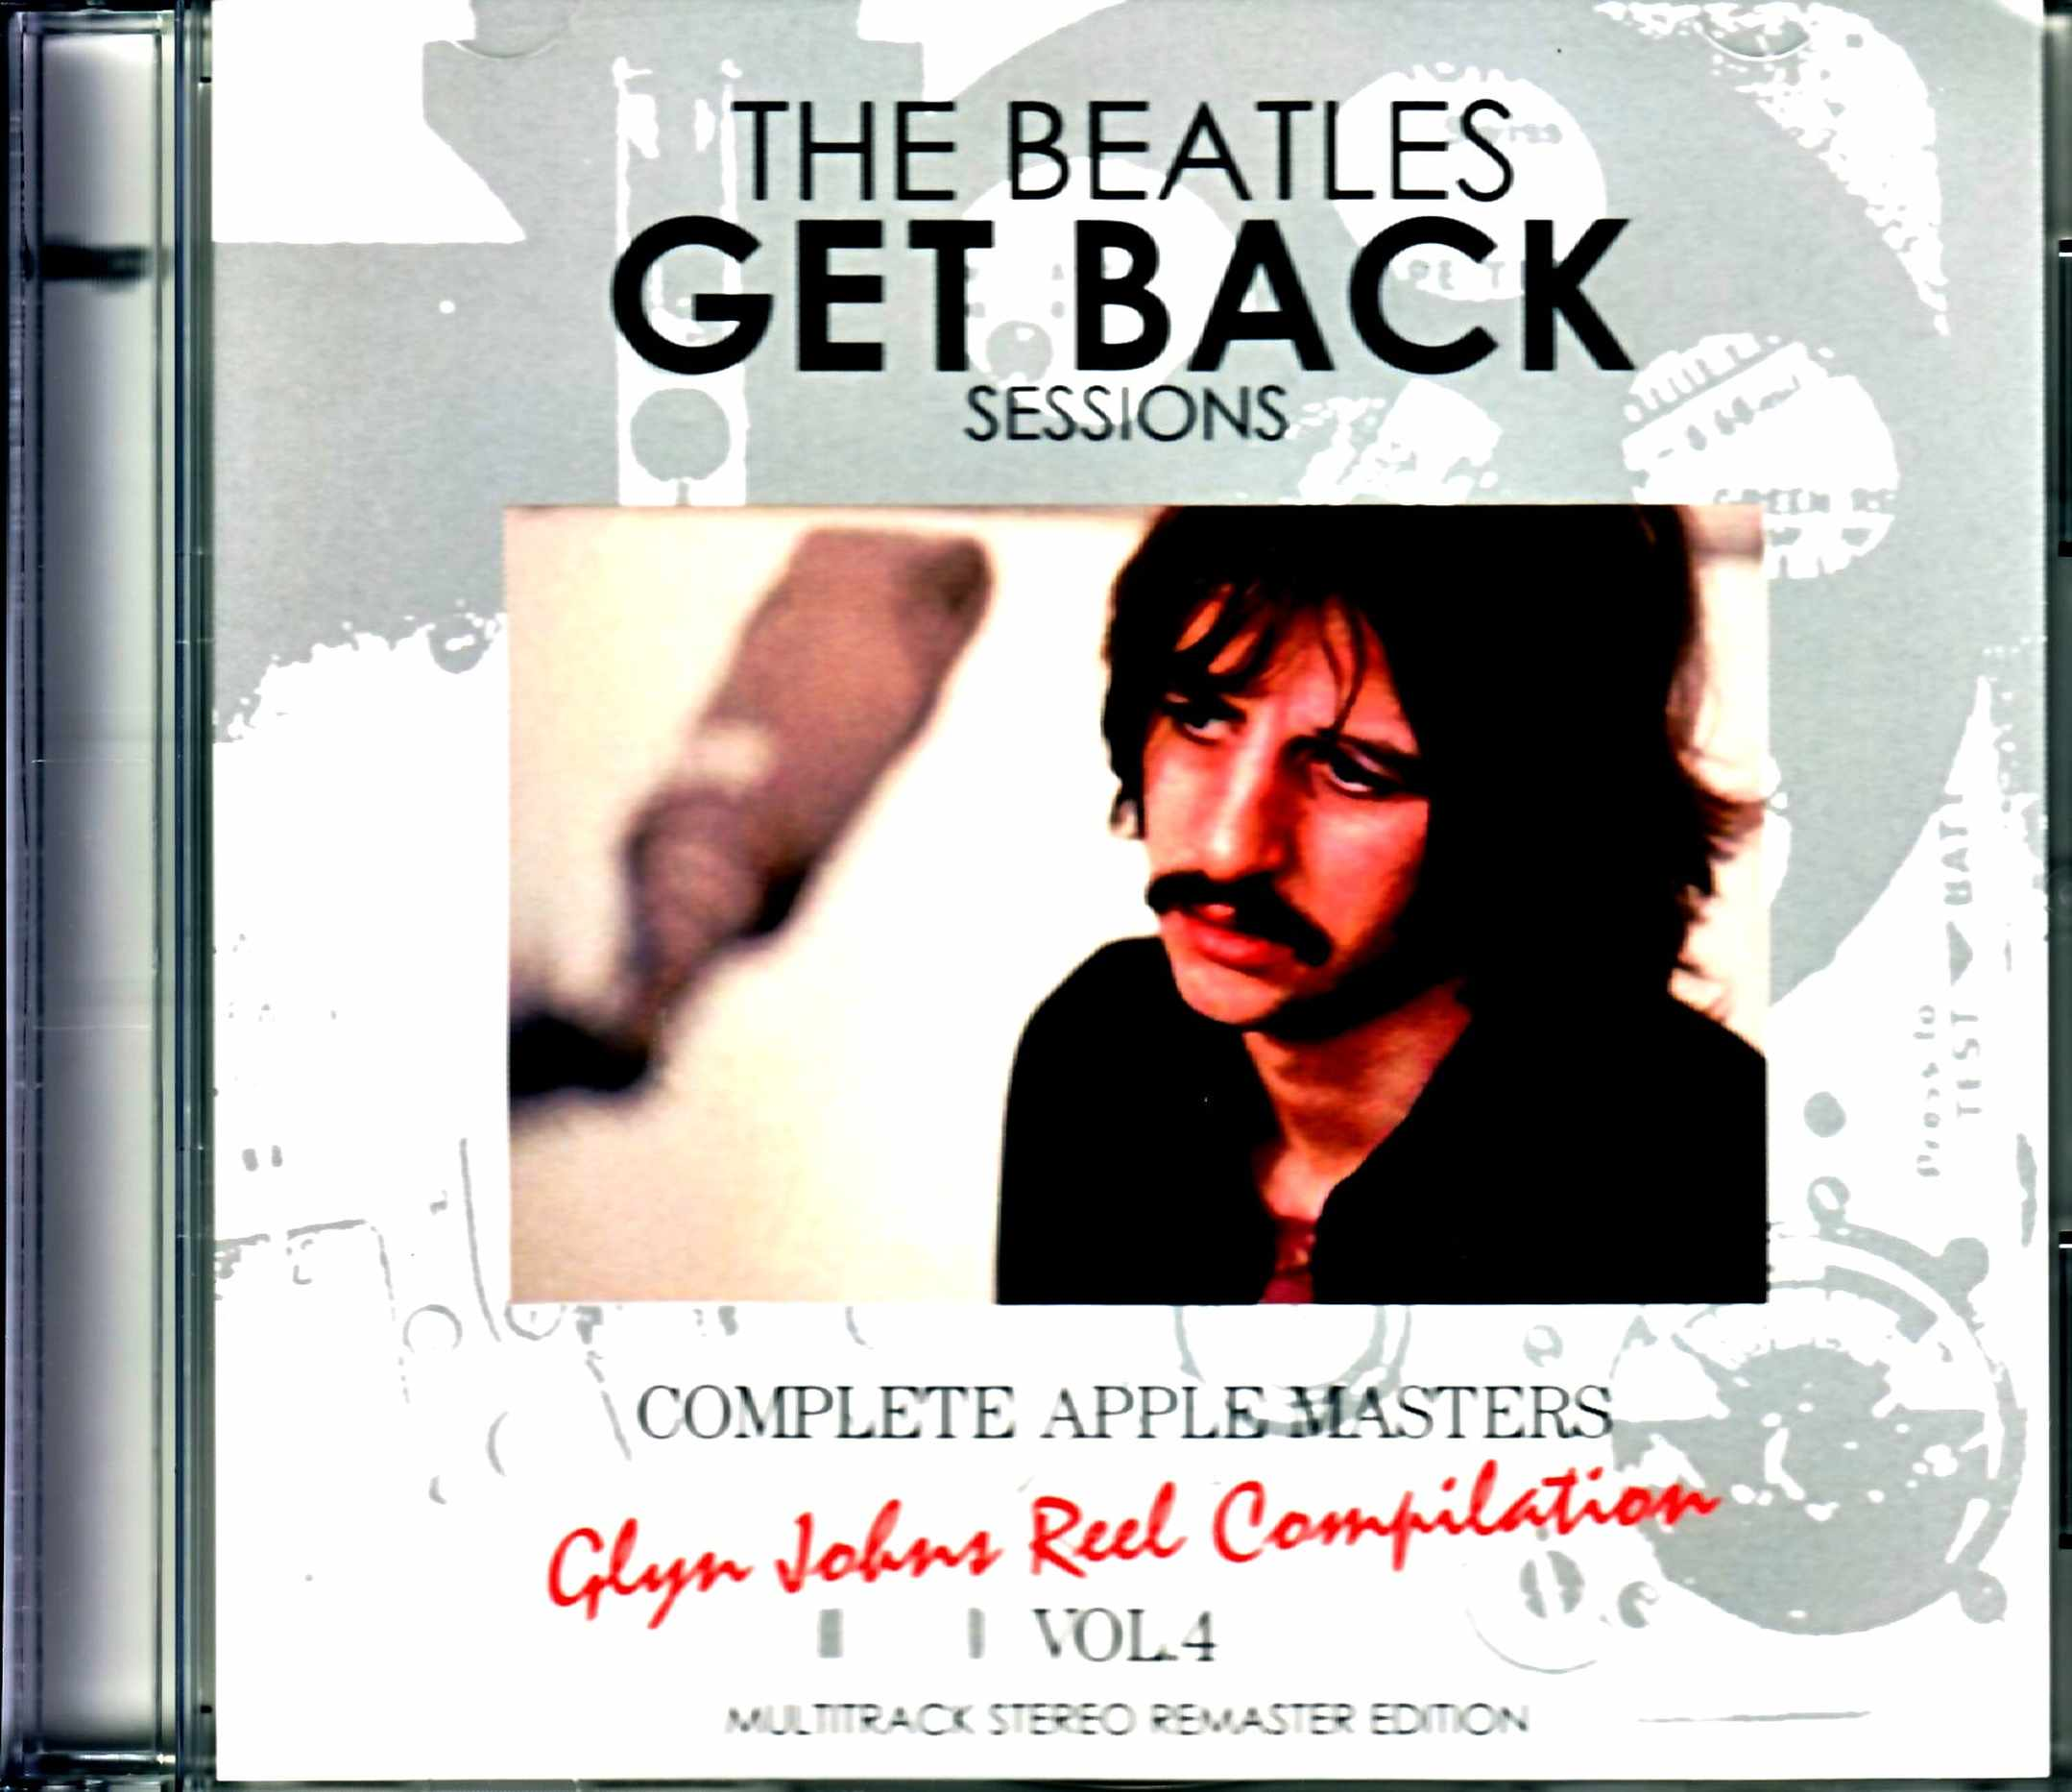 Beatles ビートルズ/ゲット・バック・セッション Glyn Johns Reel Compilation Vol.4